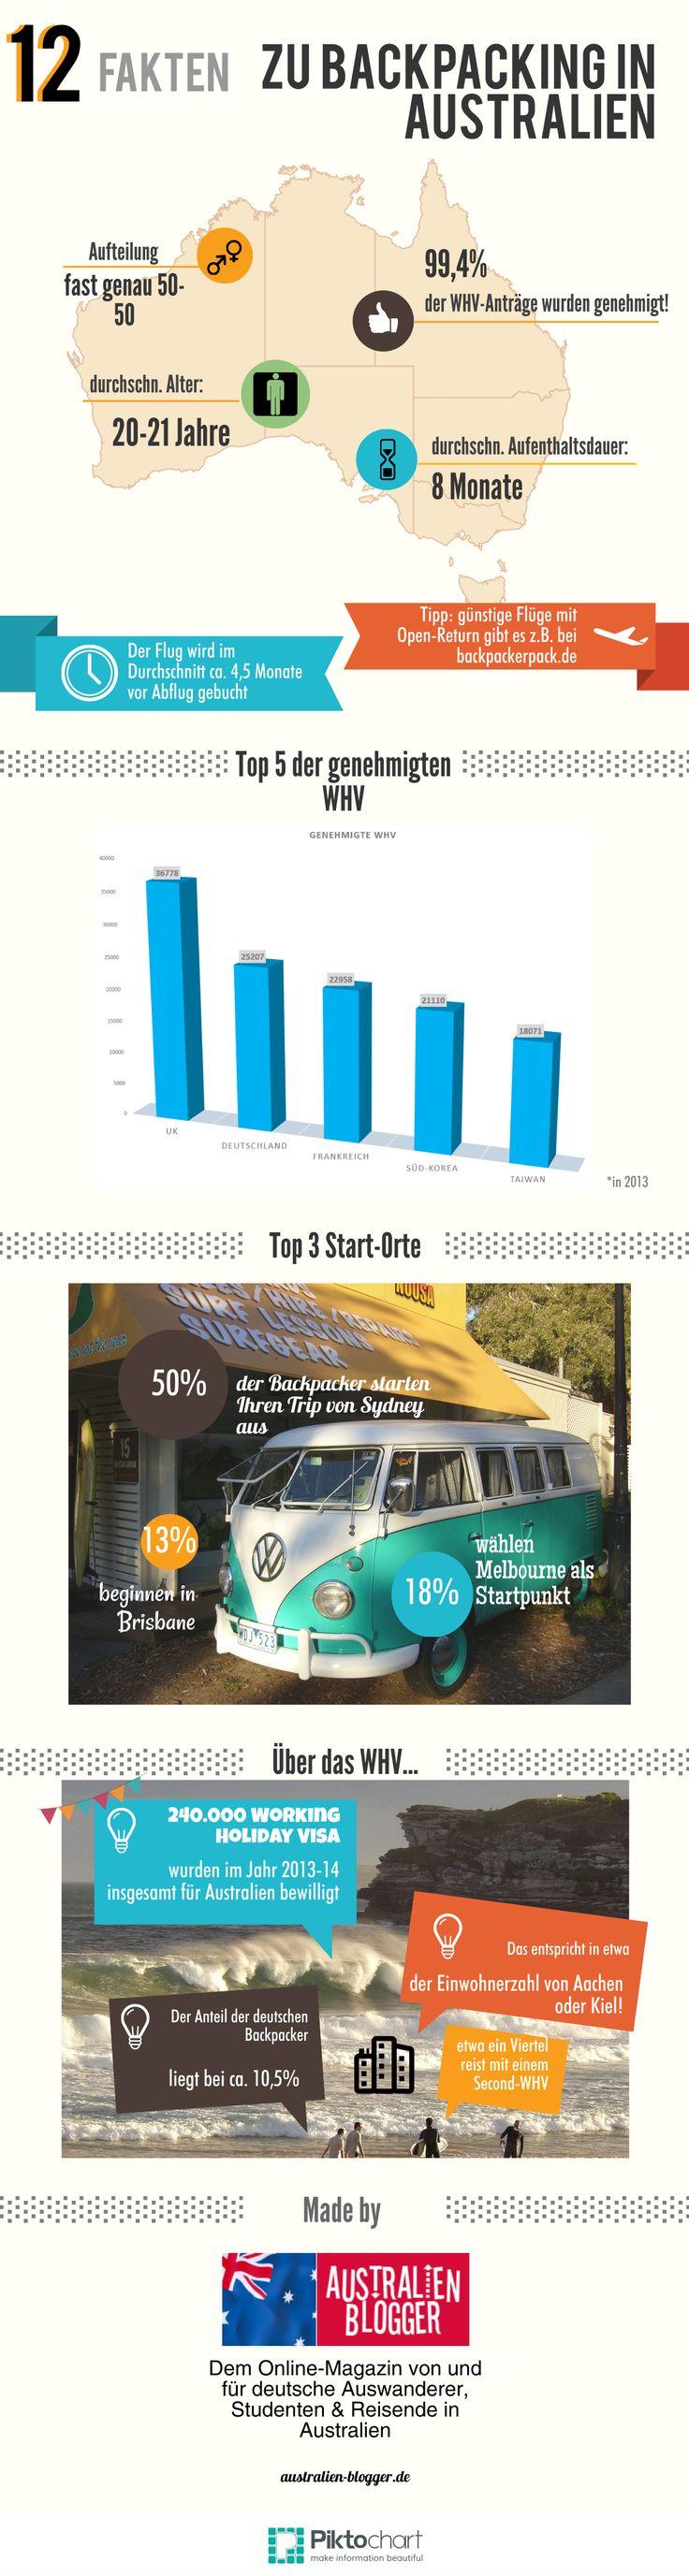 Top-12 Fakten zu #Backpacking in #Australien